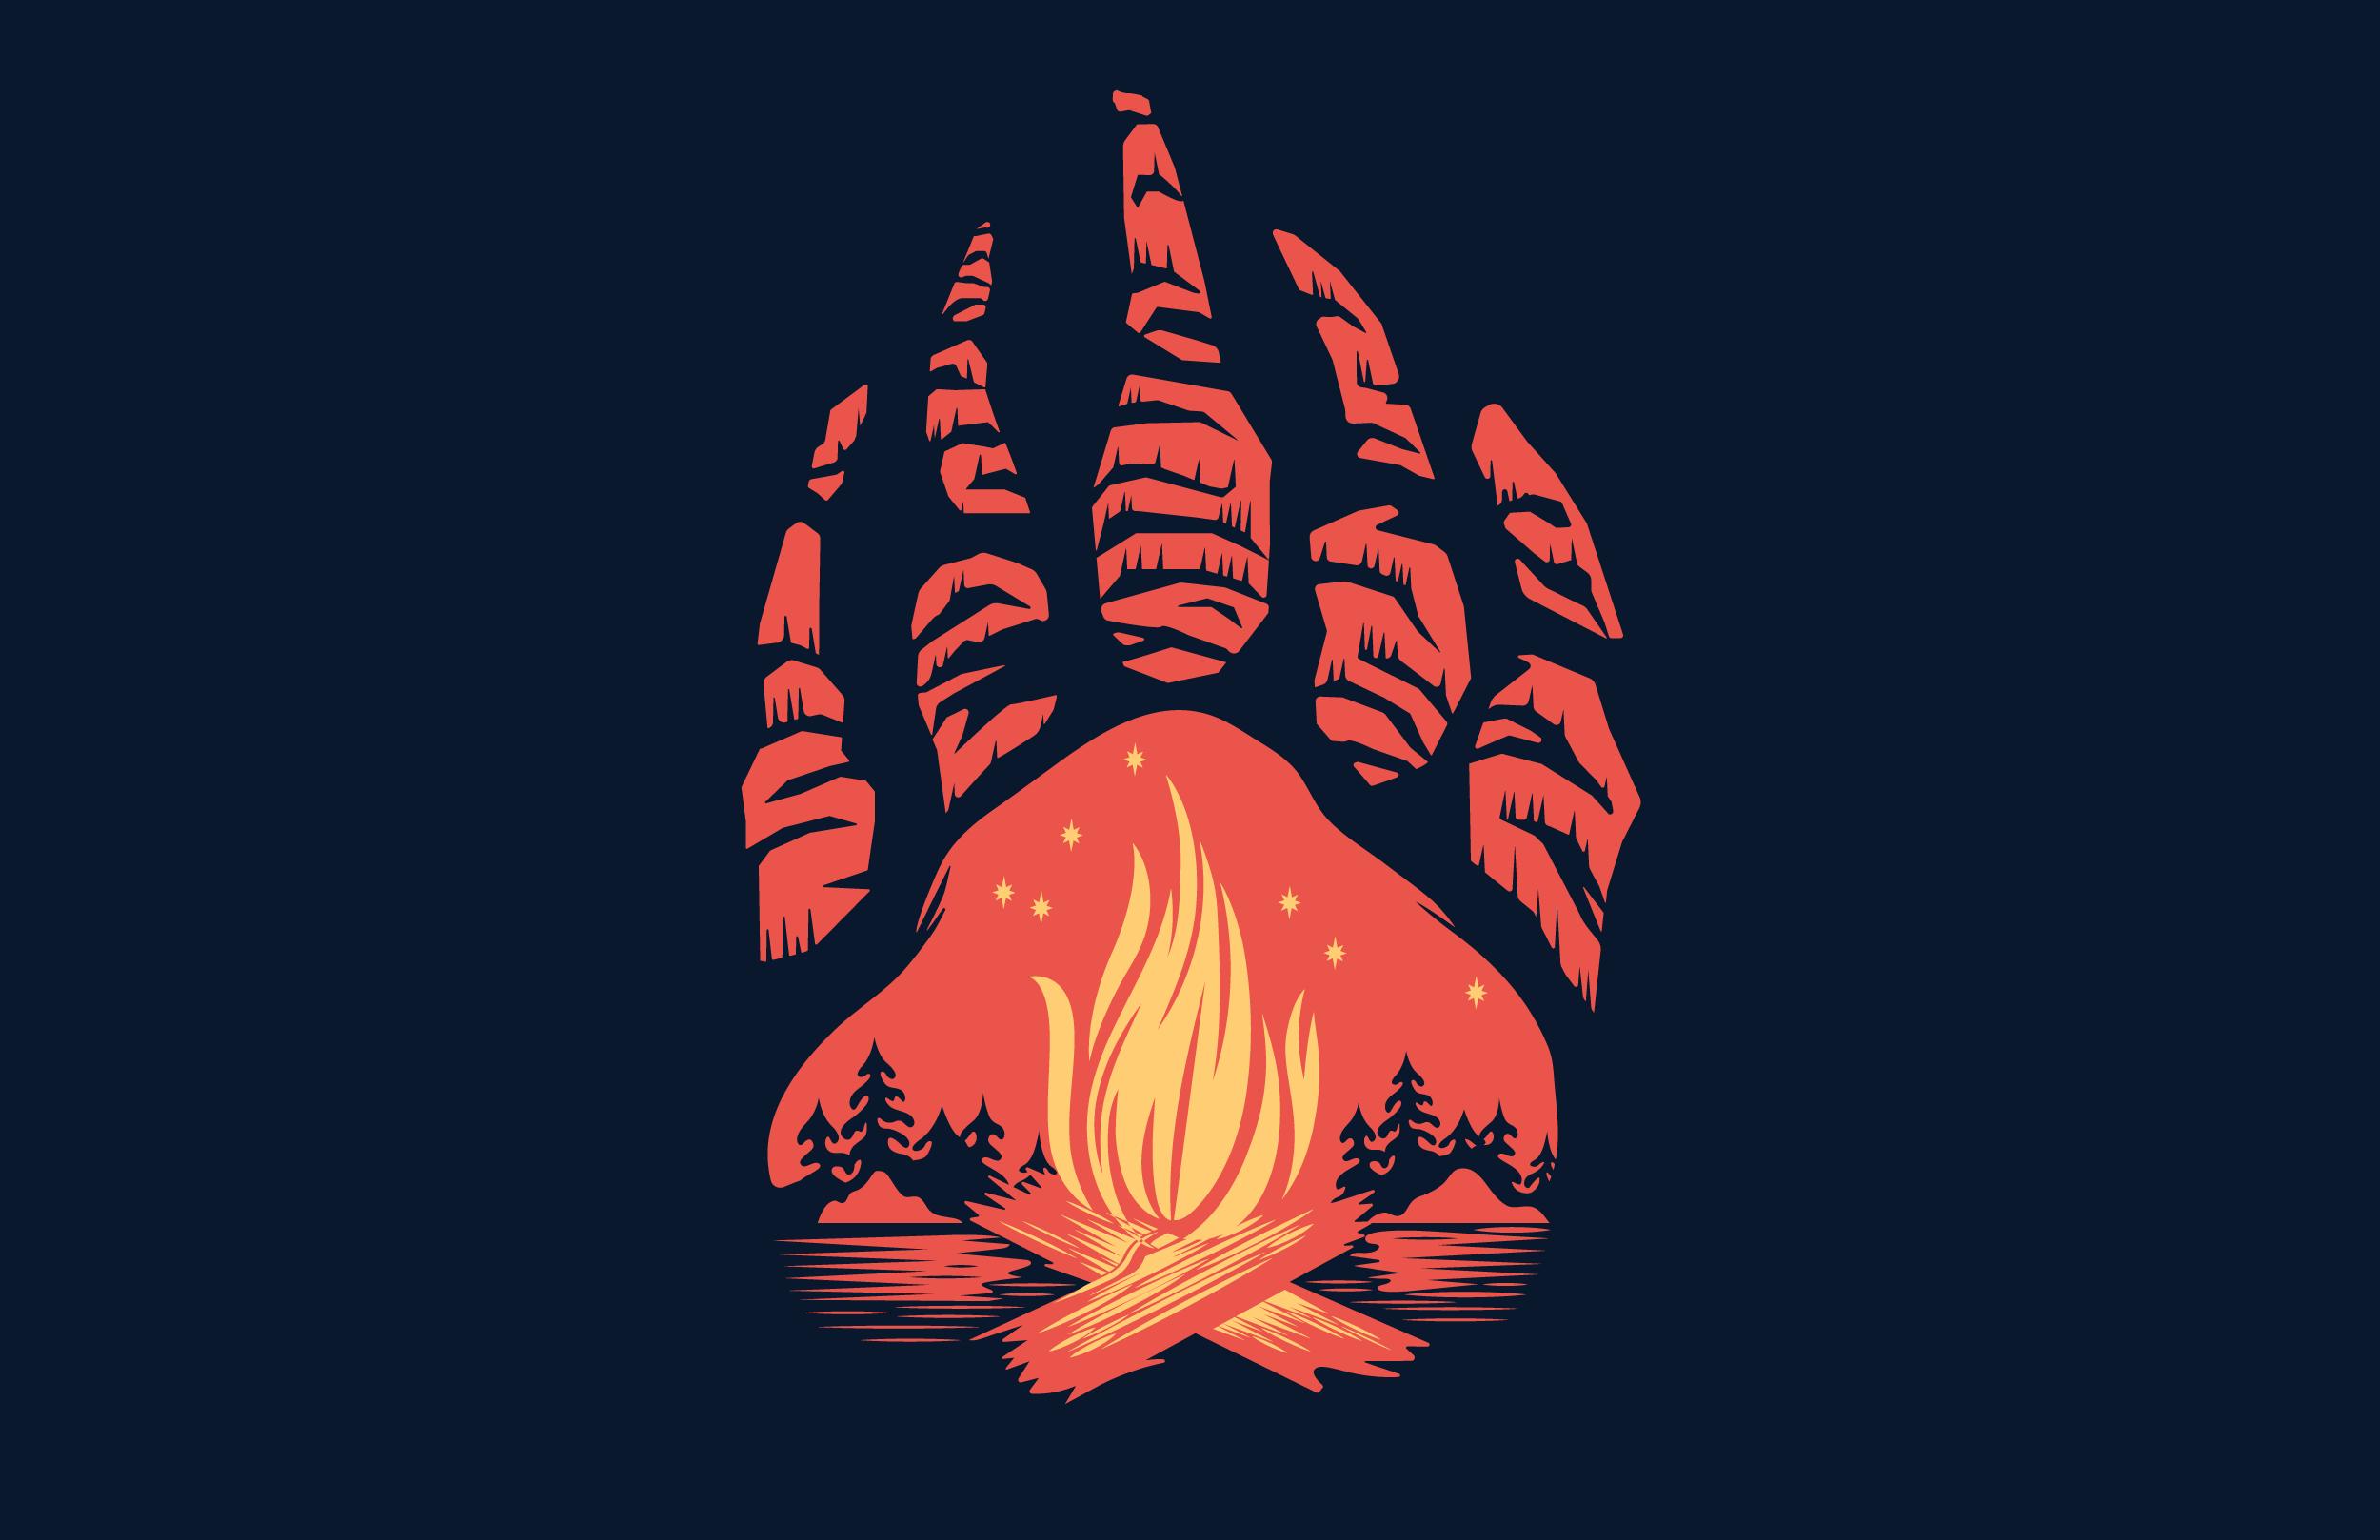 246-1743_AKHG_APPAREL_CampfirePaw_02.png